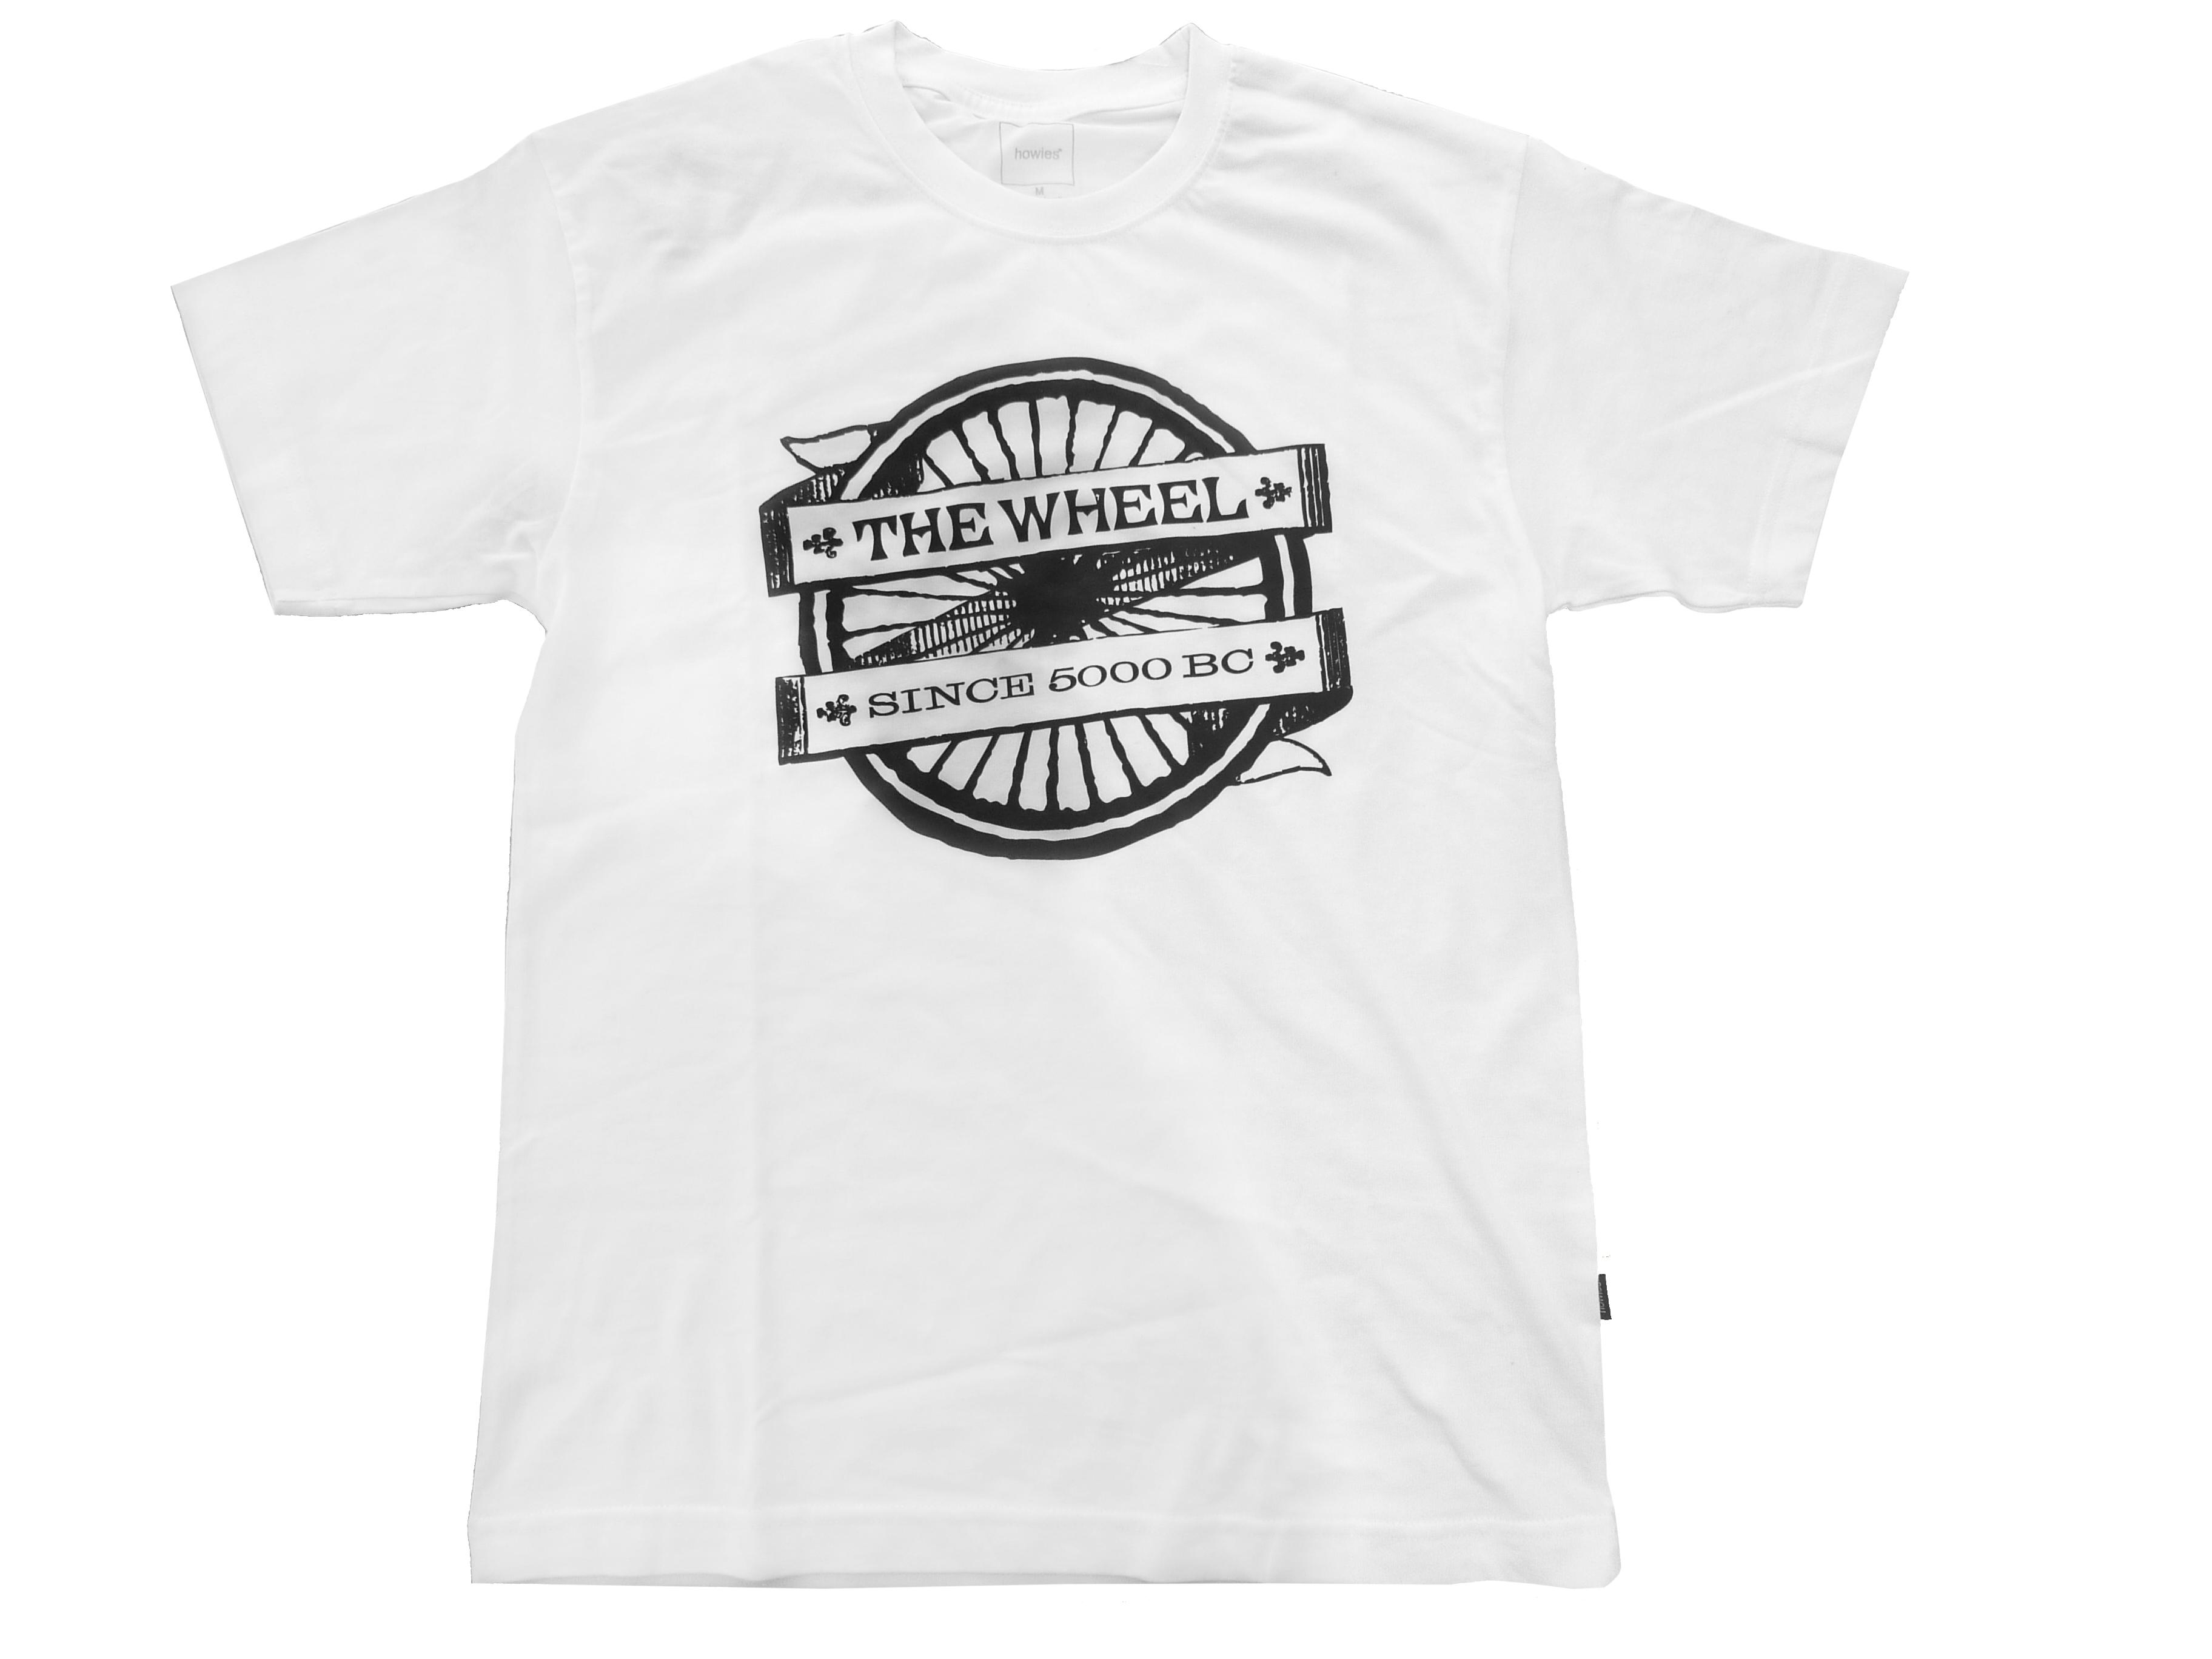 Howies Wheel T shirt.jpg